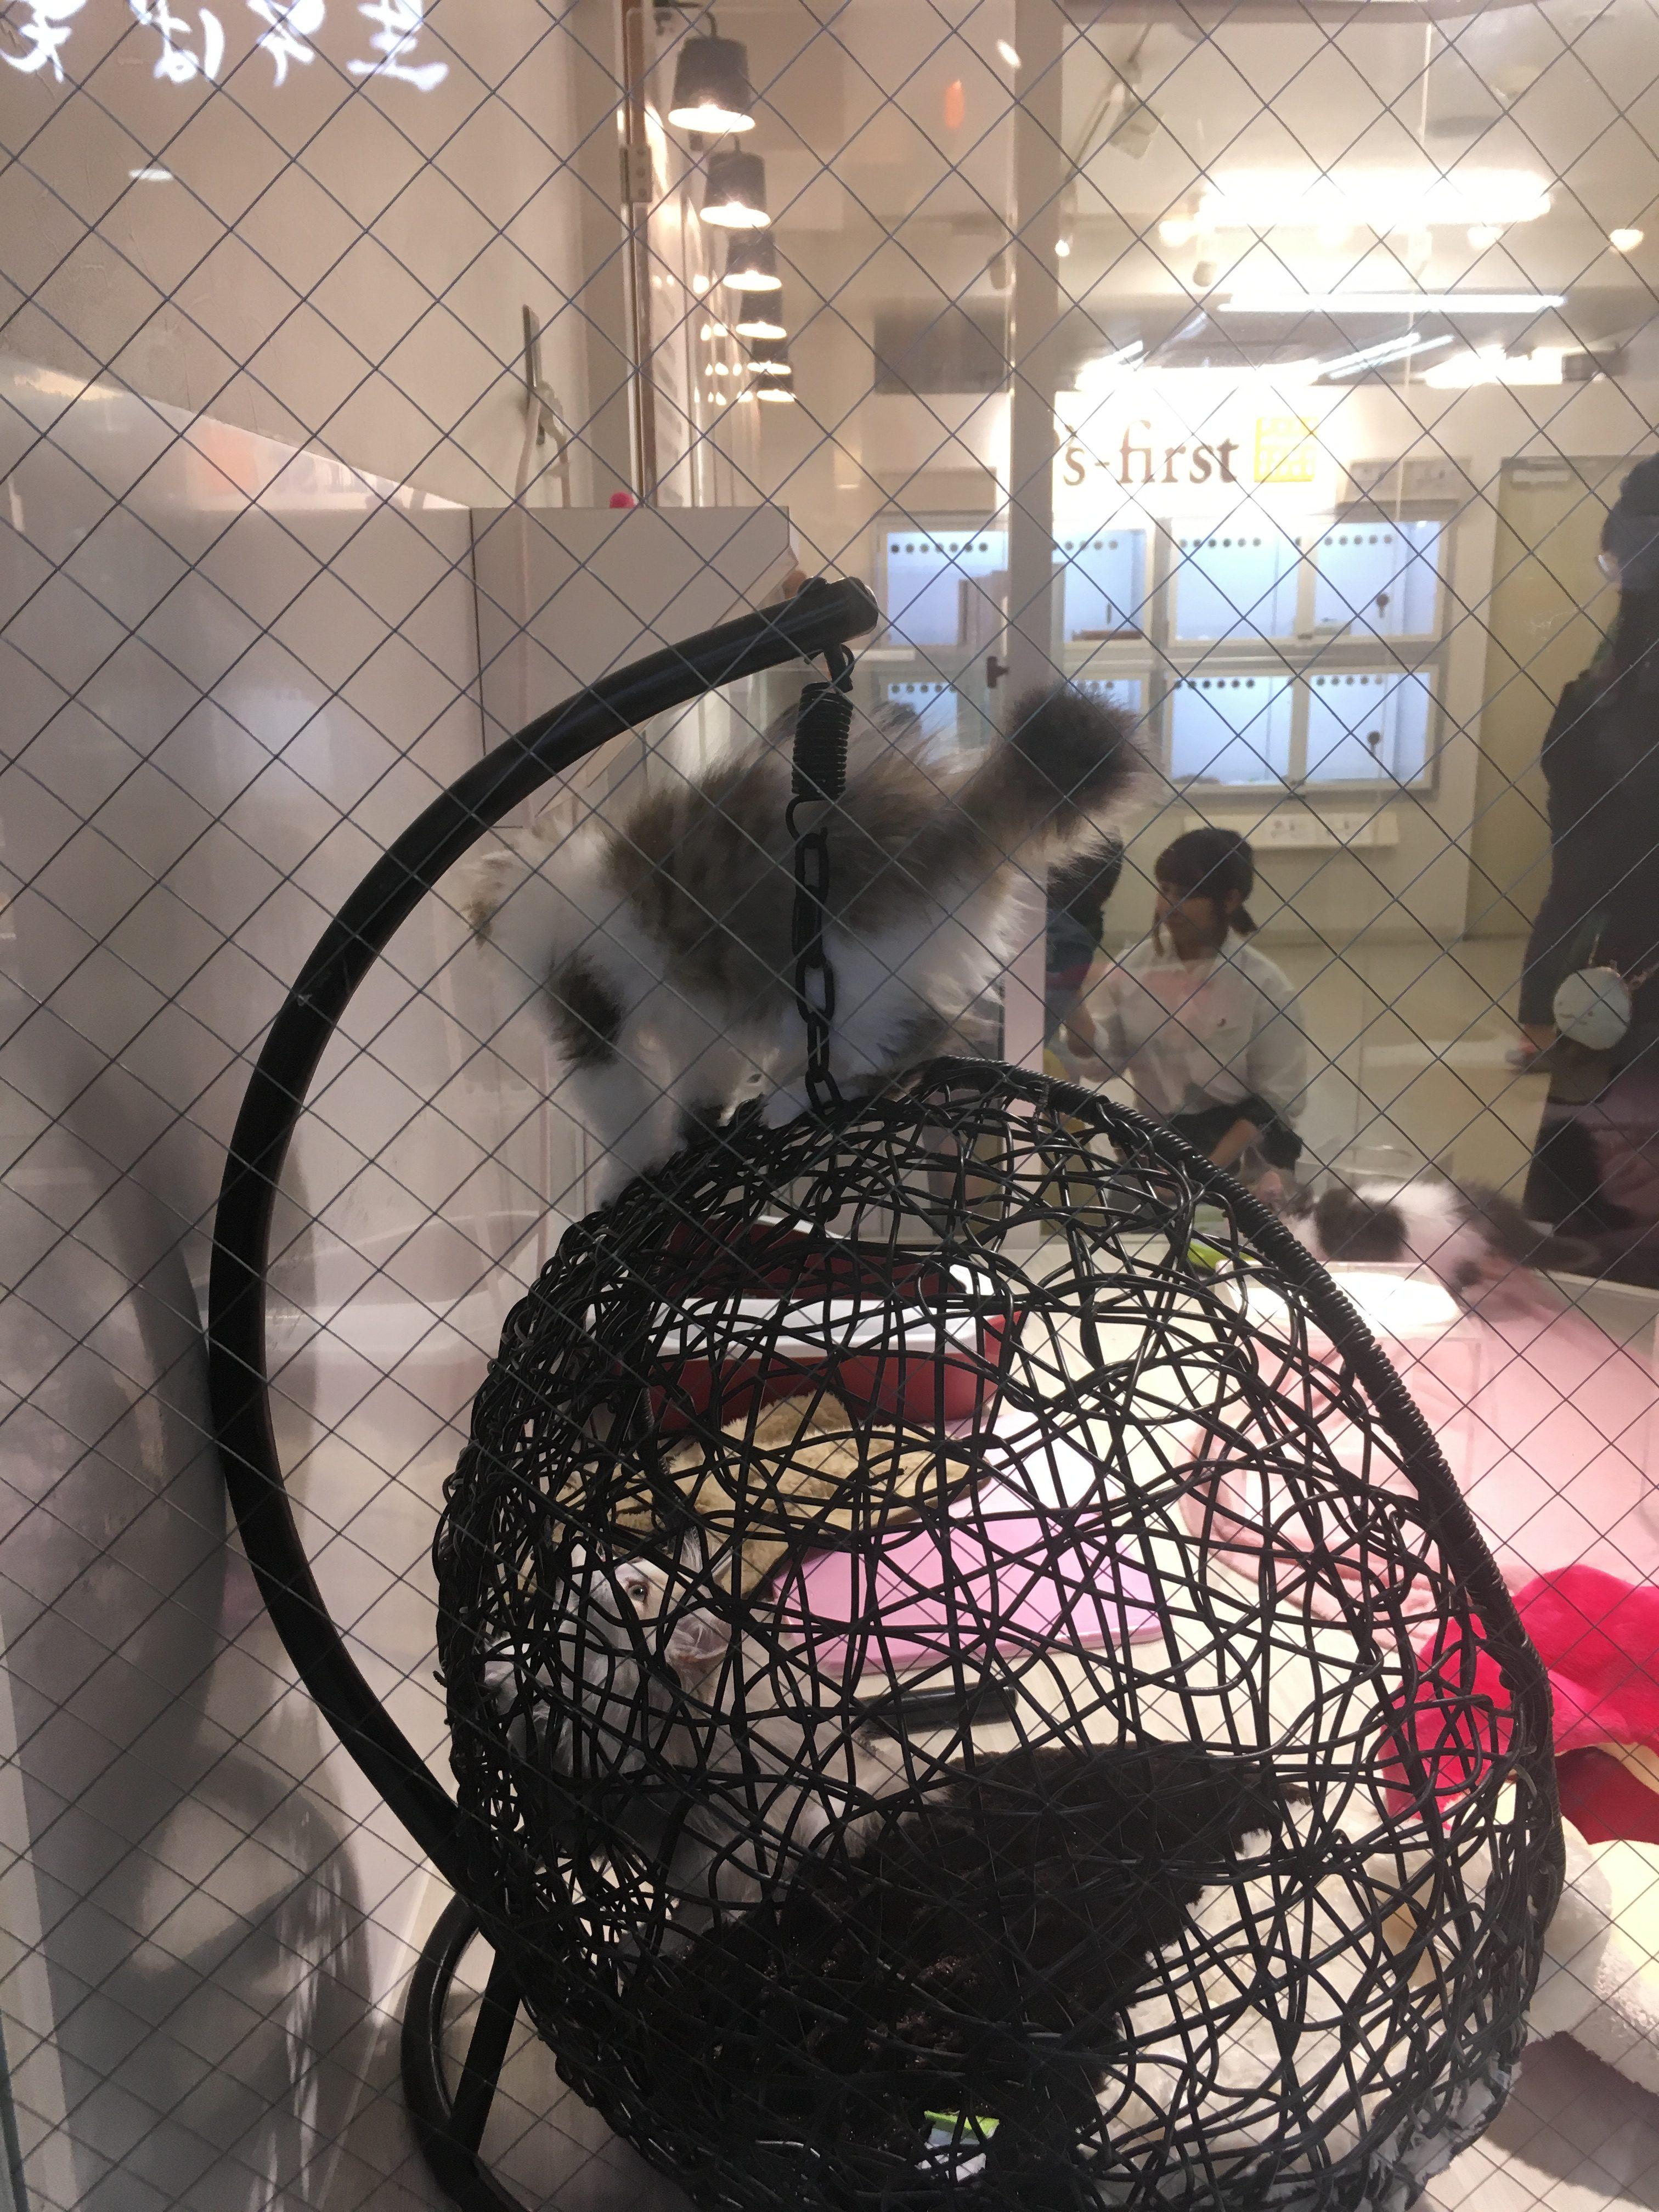 Tiny Rabbit Hole – Puppy Yarn Amigurumi Crochet Shop Tokyo Japan Knitting European Katia